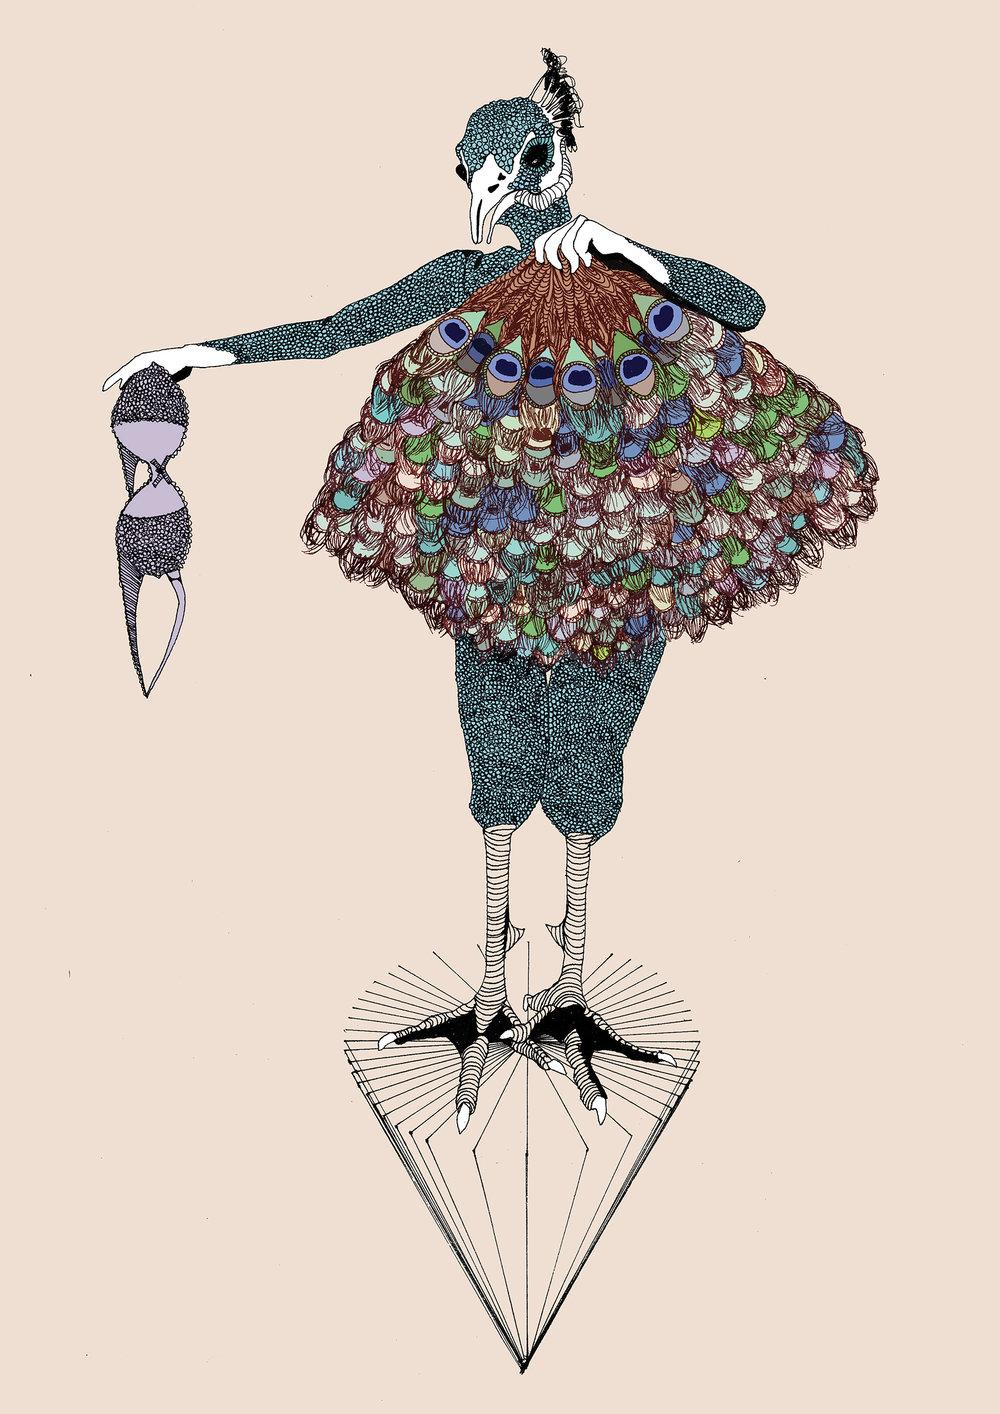 My original Blind Pig Illustration (2011)